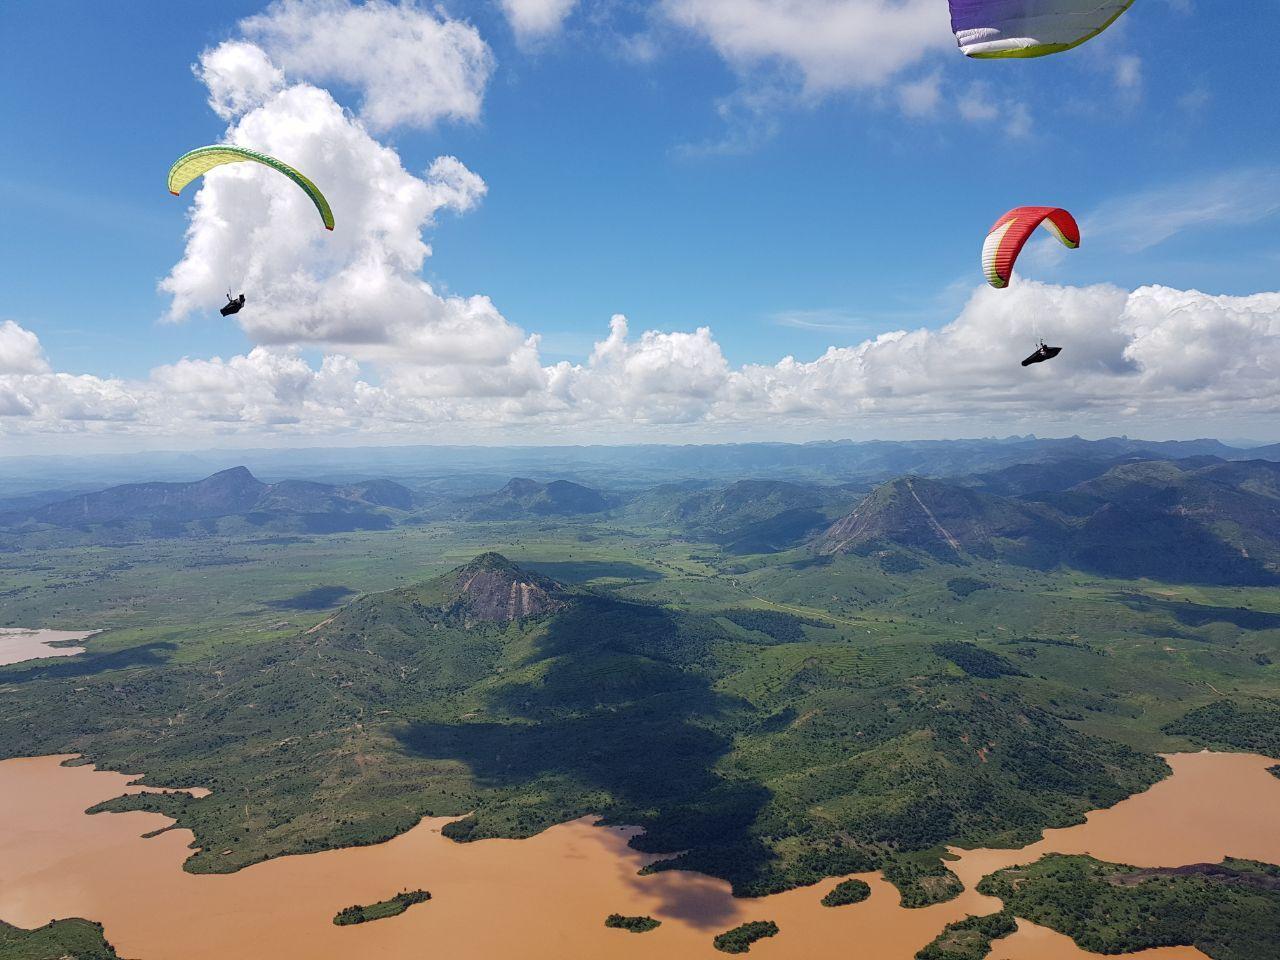 Brasil flying with FlySpain, winter paragliding tours